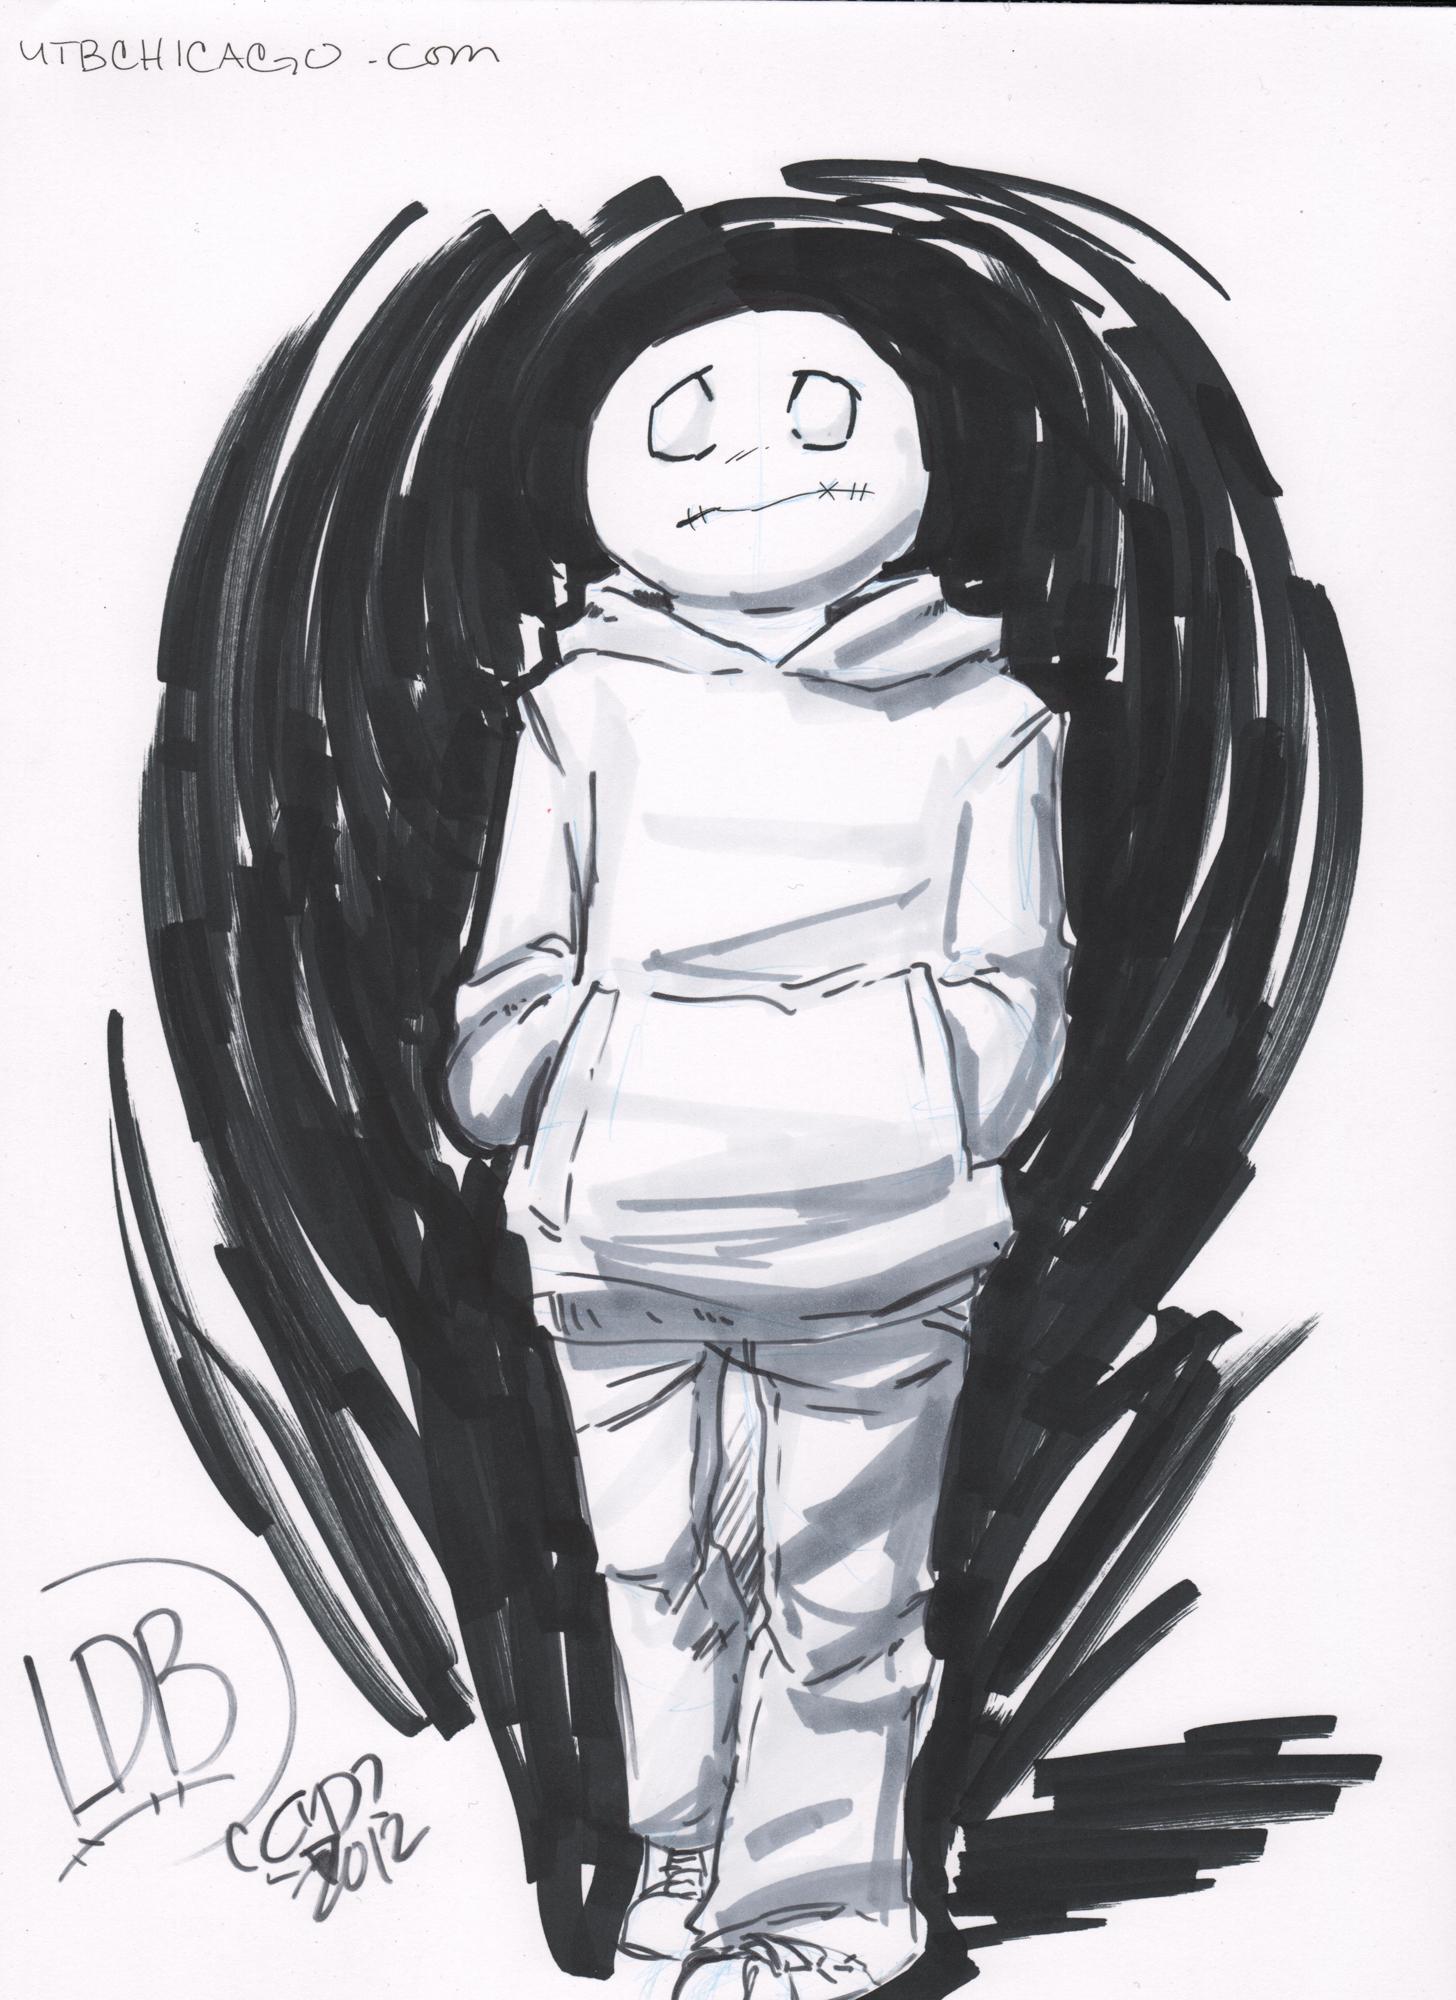 Lil' depressed boy by coolmonkeyd